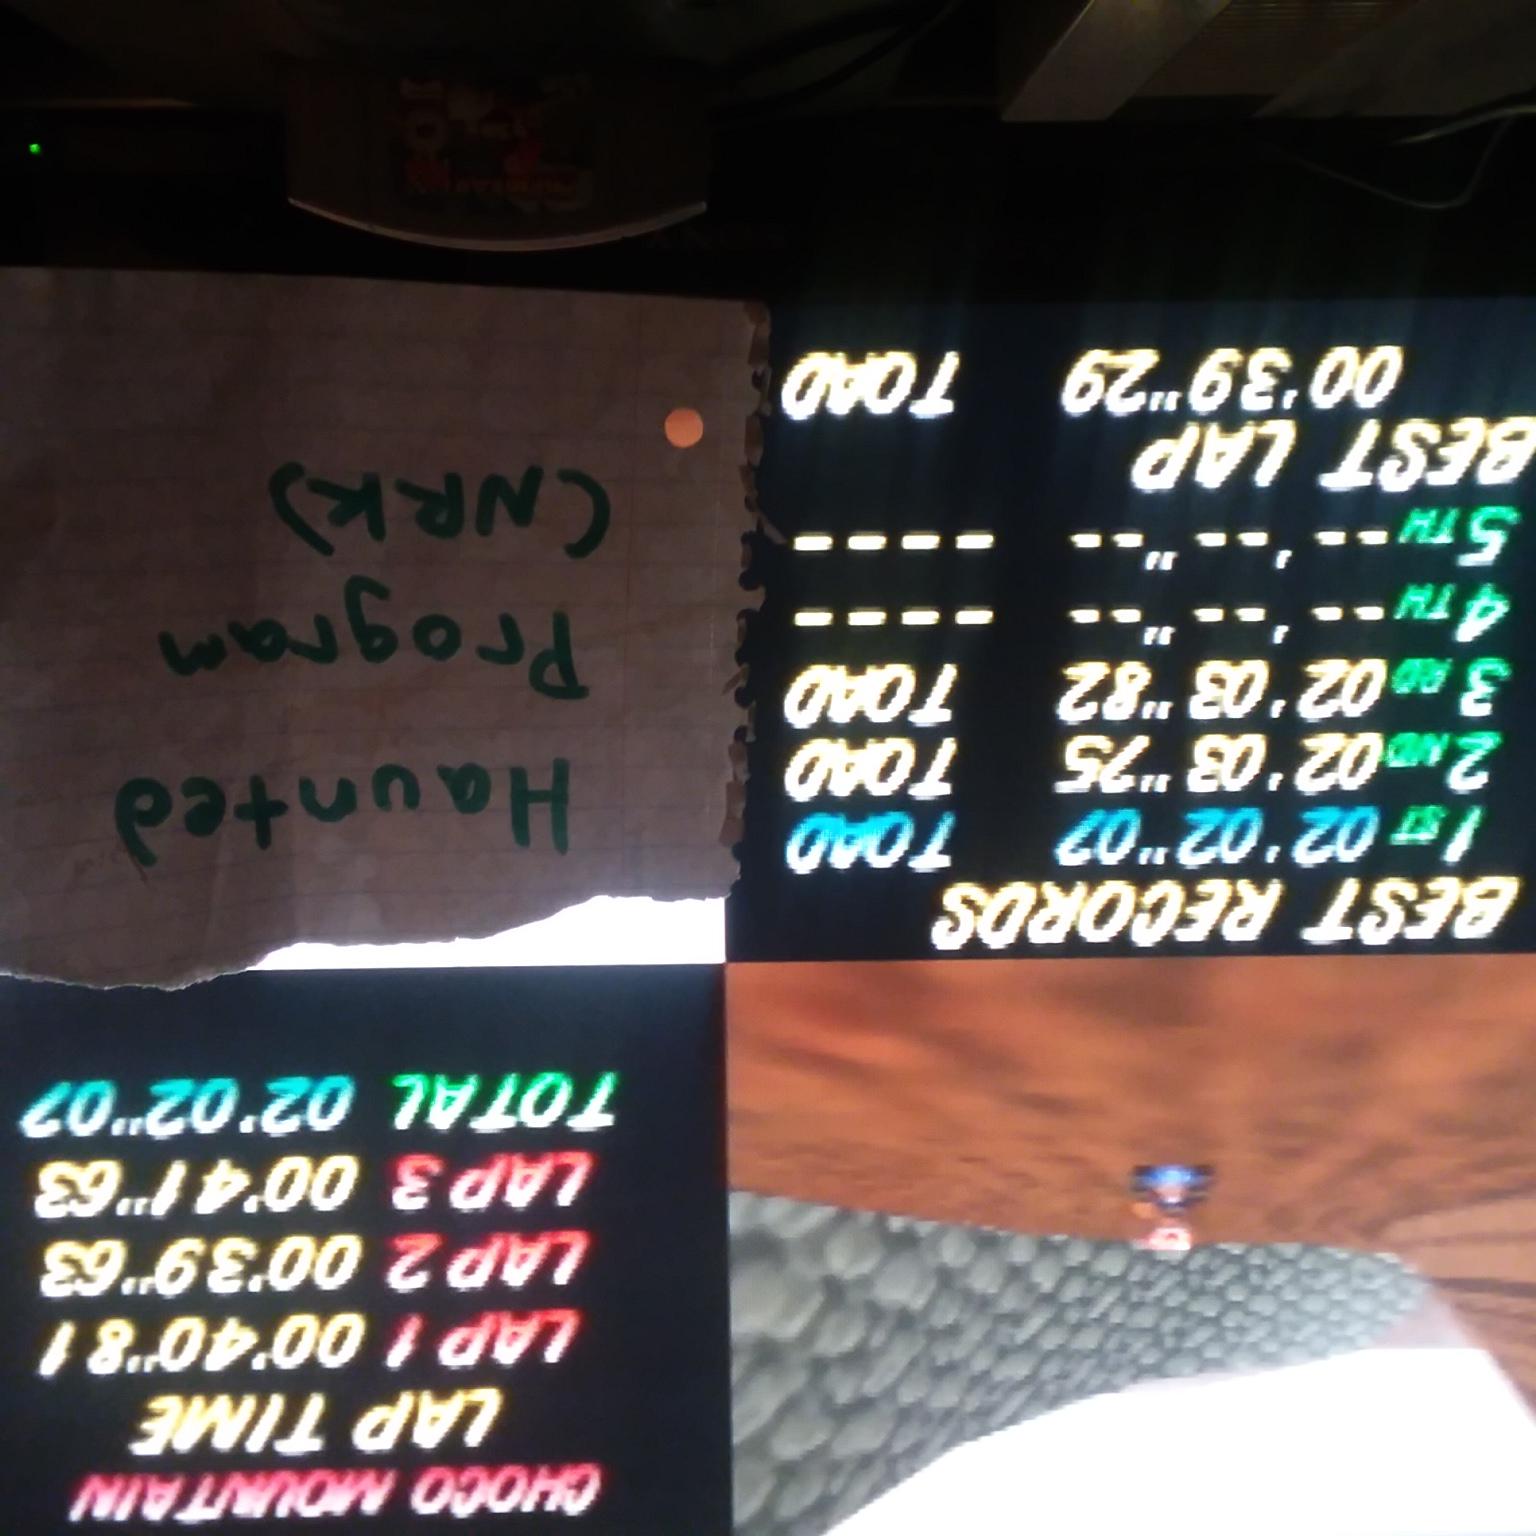 Mario Kart 64: Choco Mountain [Time Trial] time of 0:02:02.07